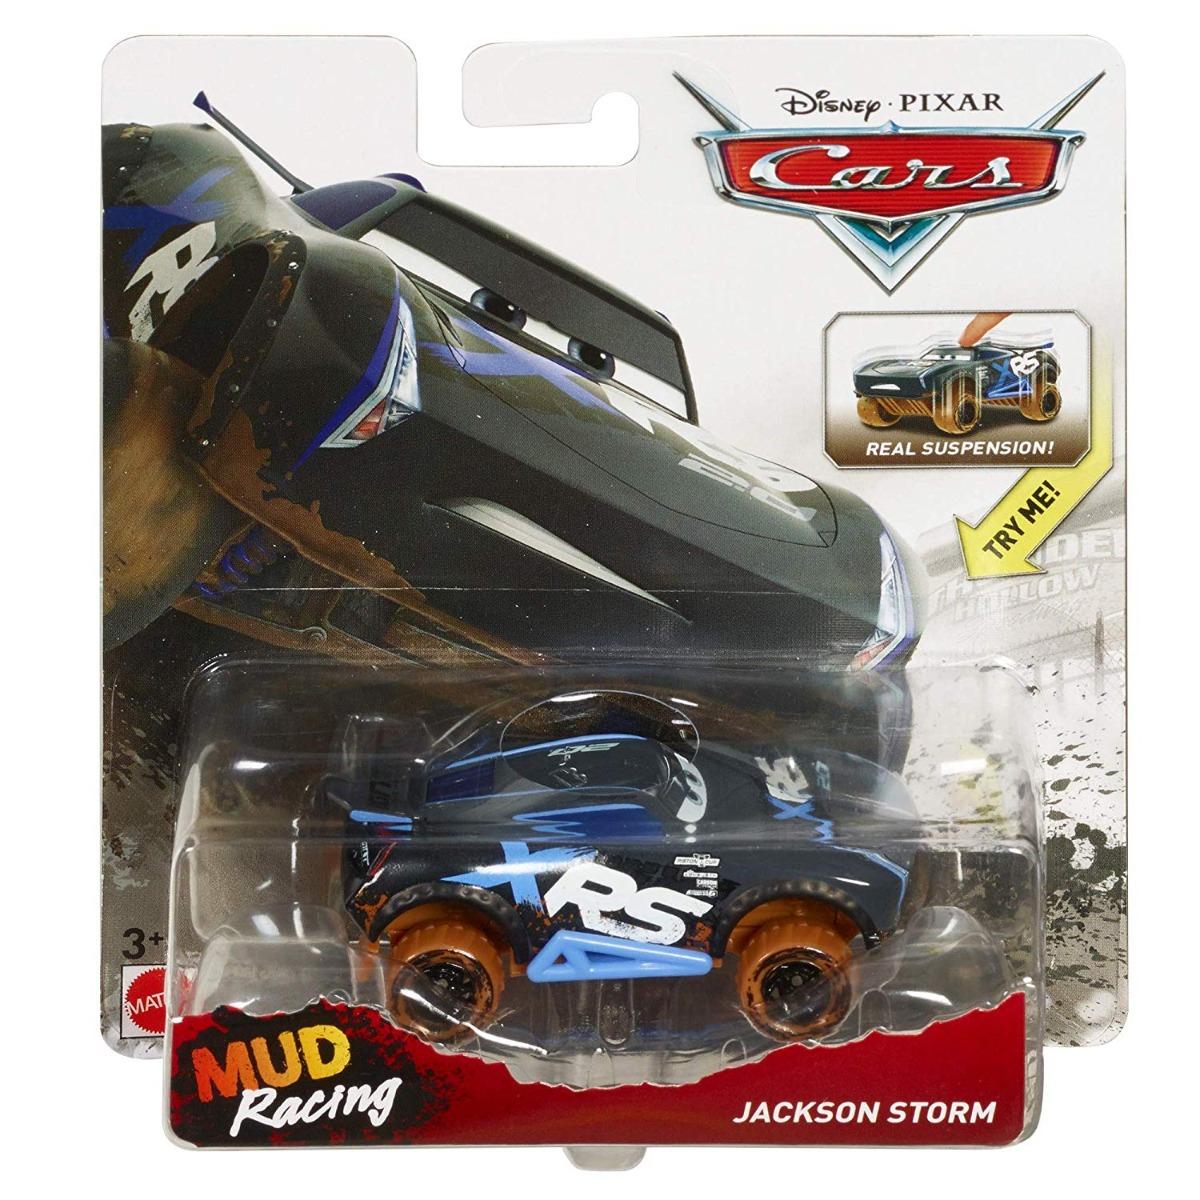 Masinuta Disney Cars XRS Mud Racing, Jackson Storm, GBJ38